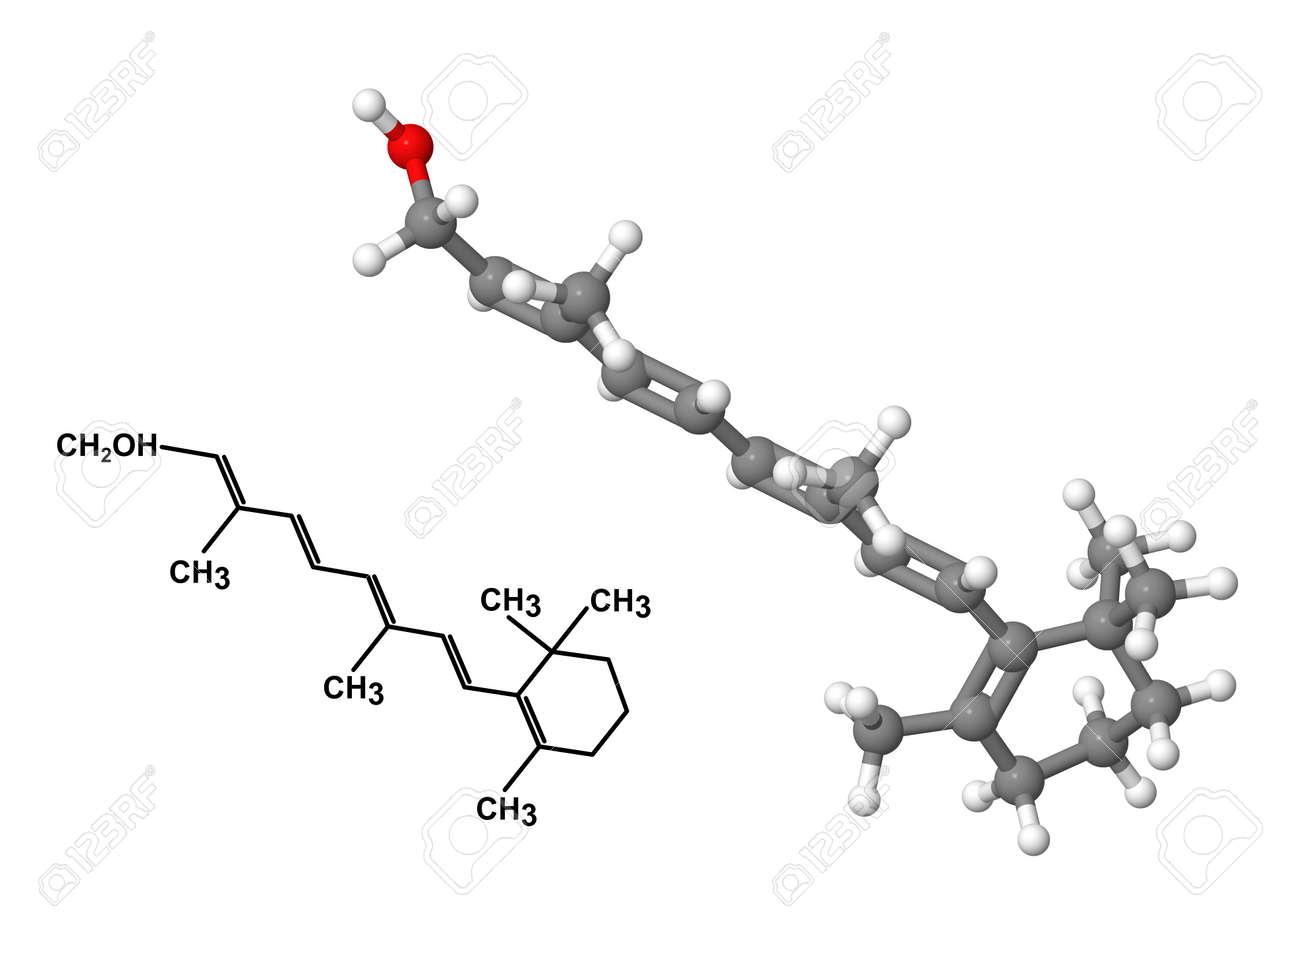 buy erythromycin online no prescription